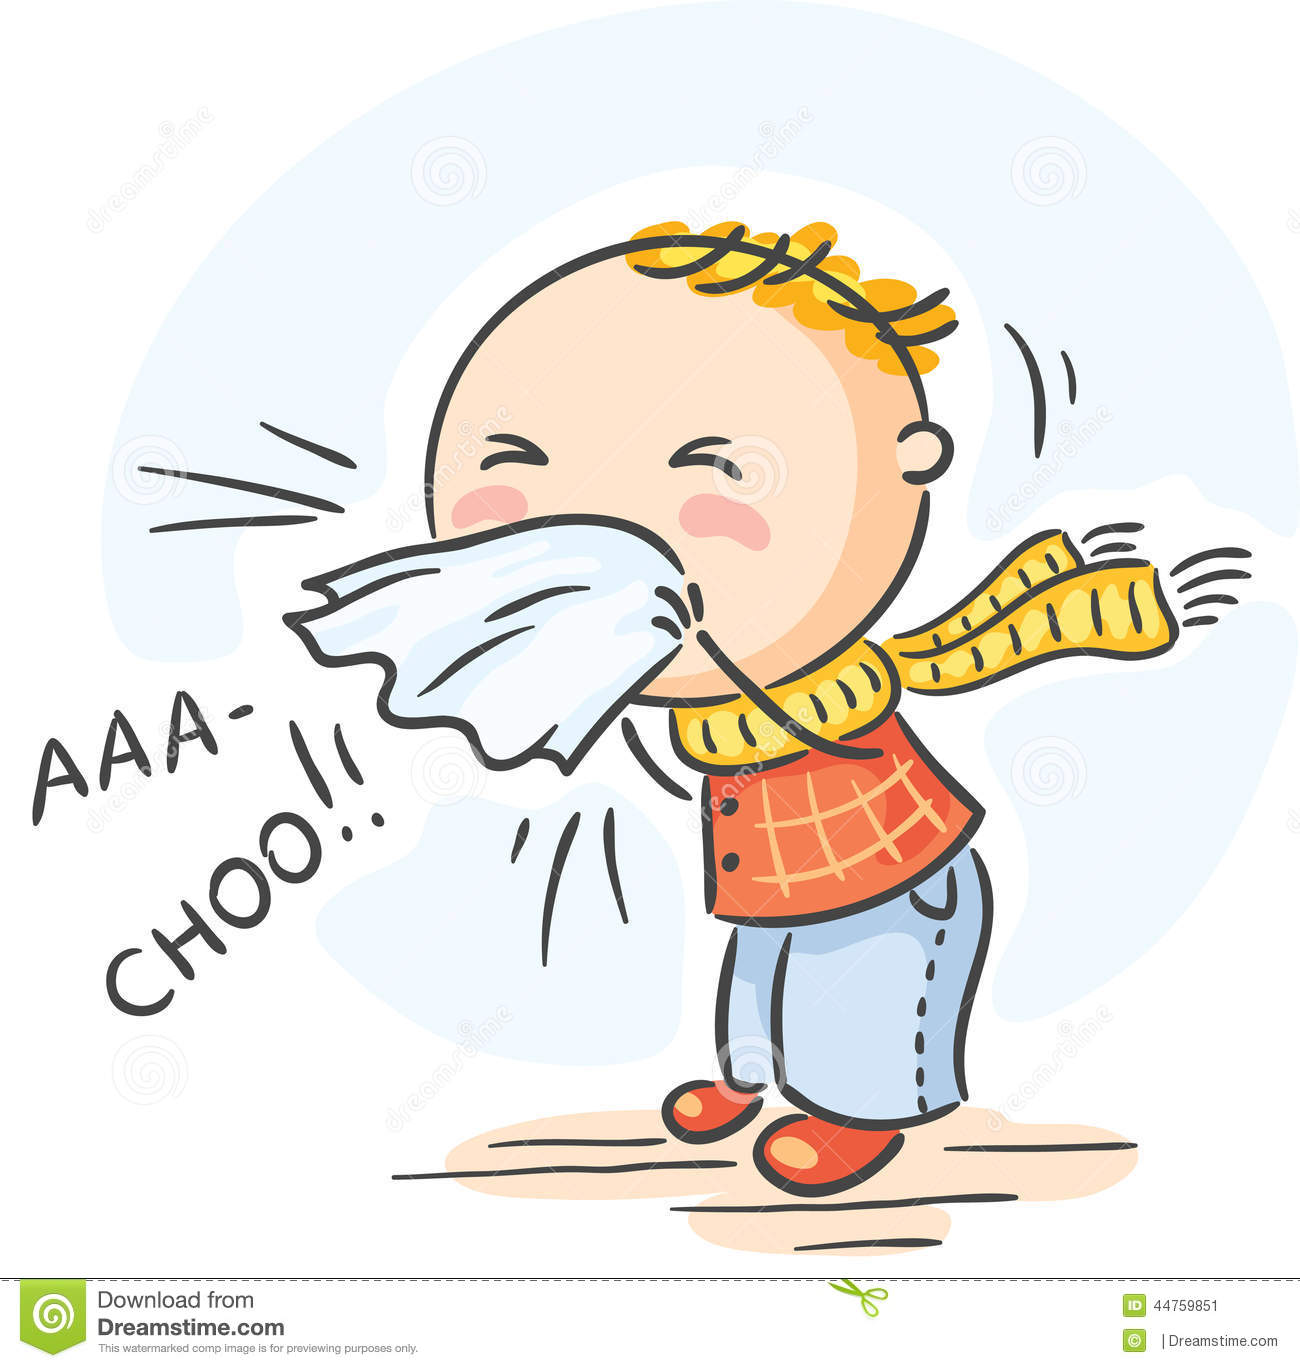 Flu clipart. Clip art free panda